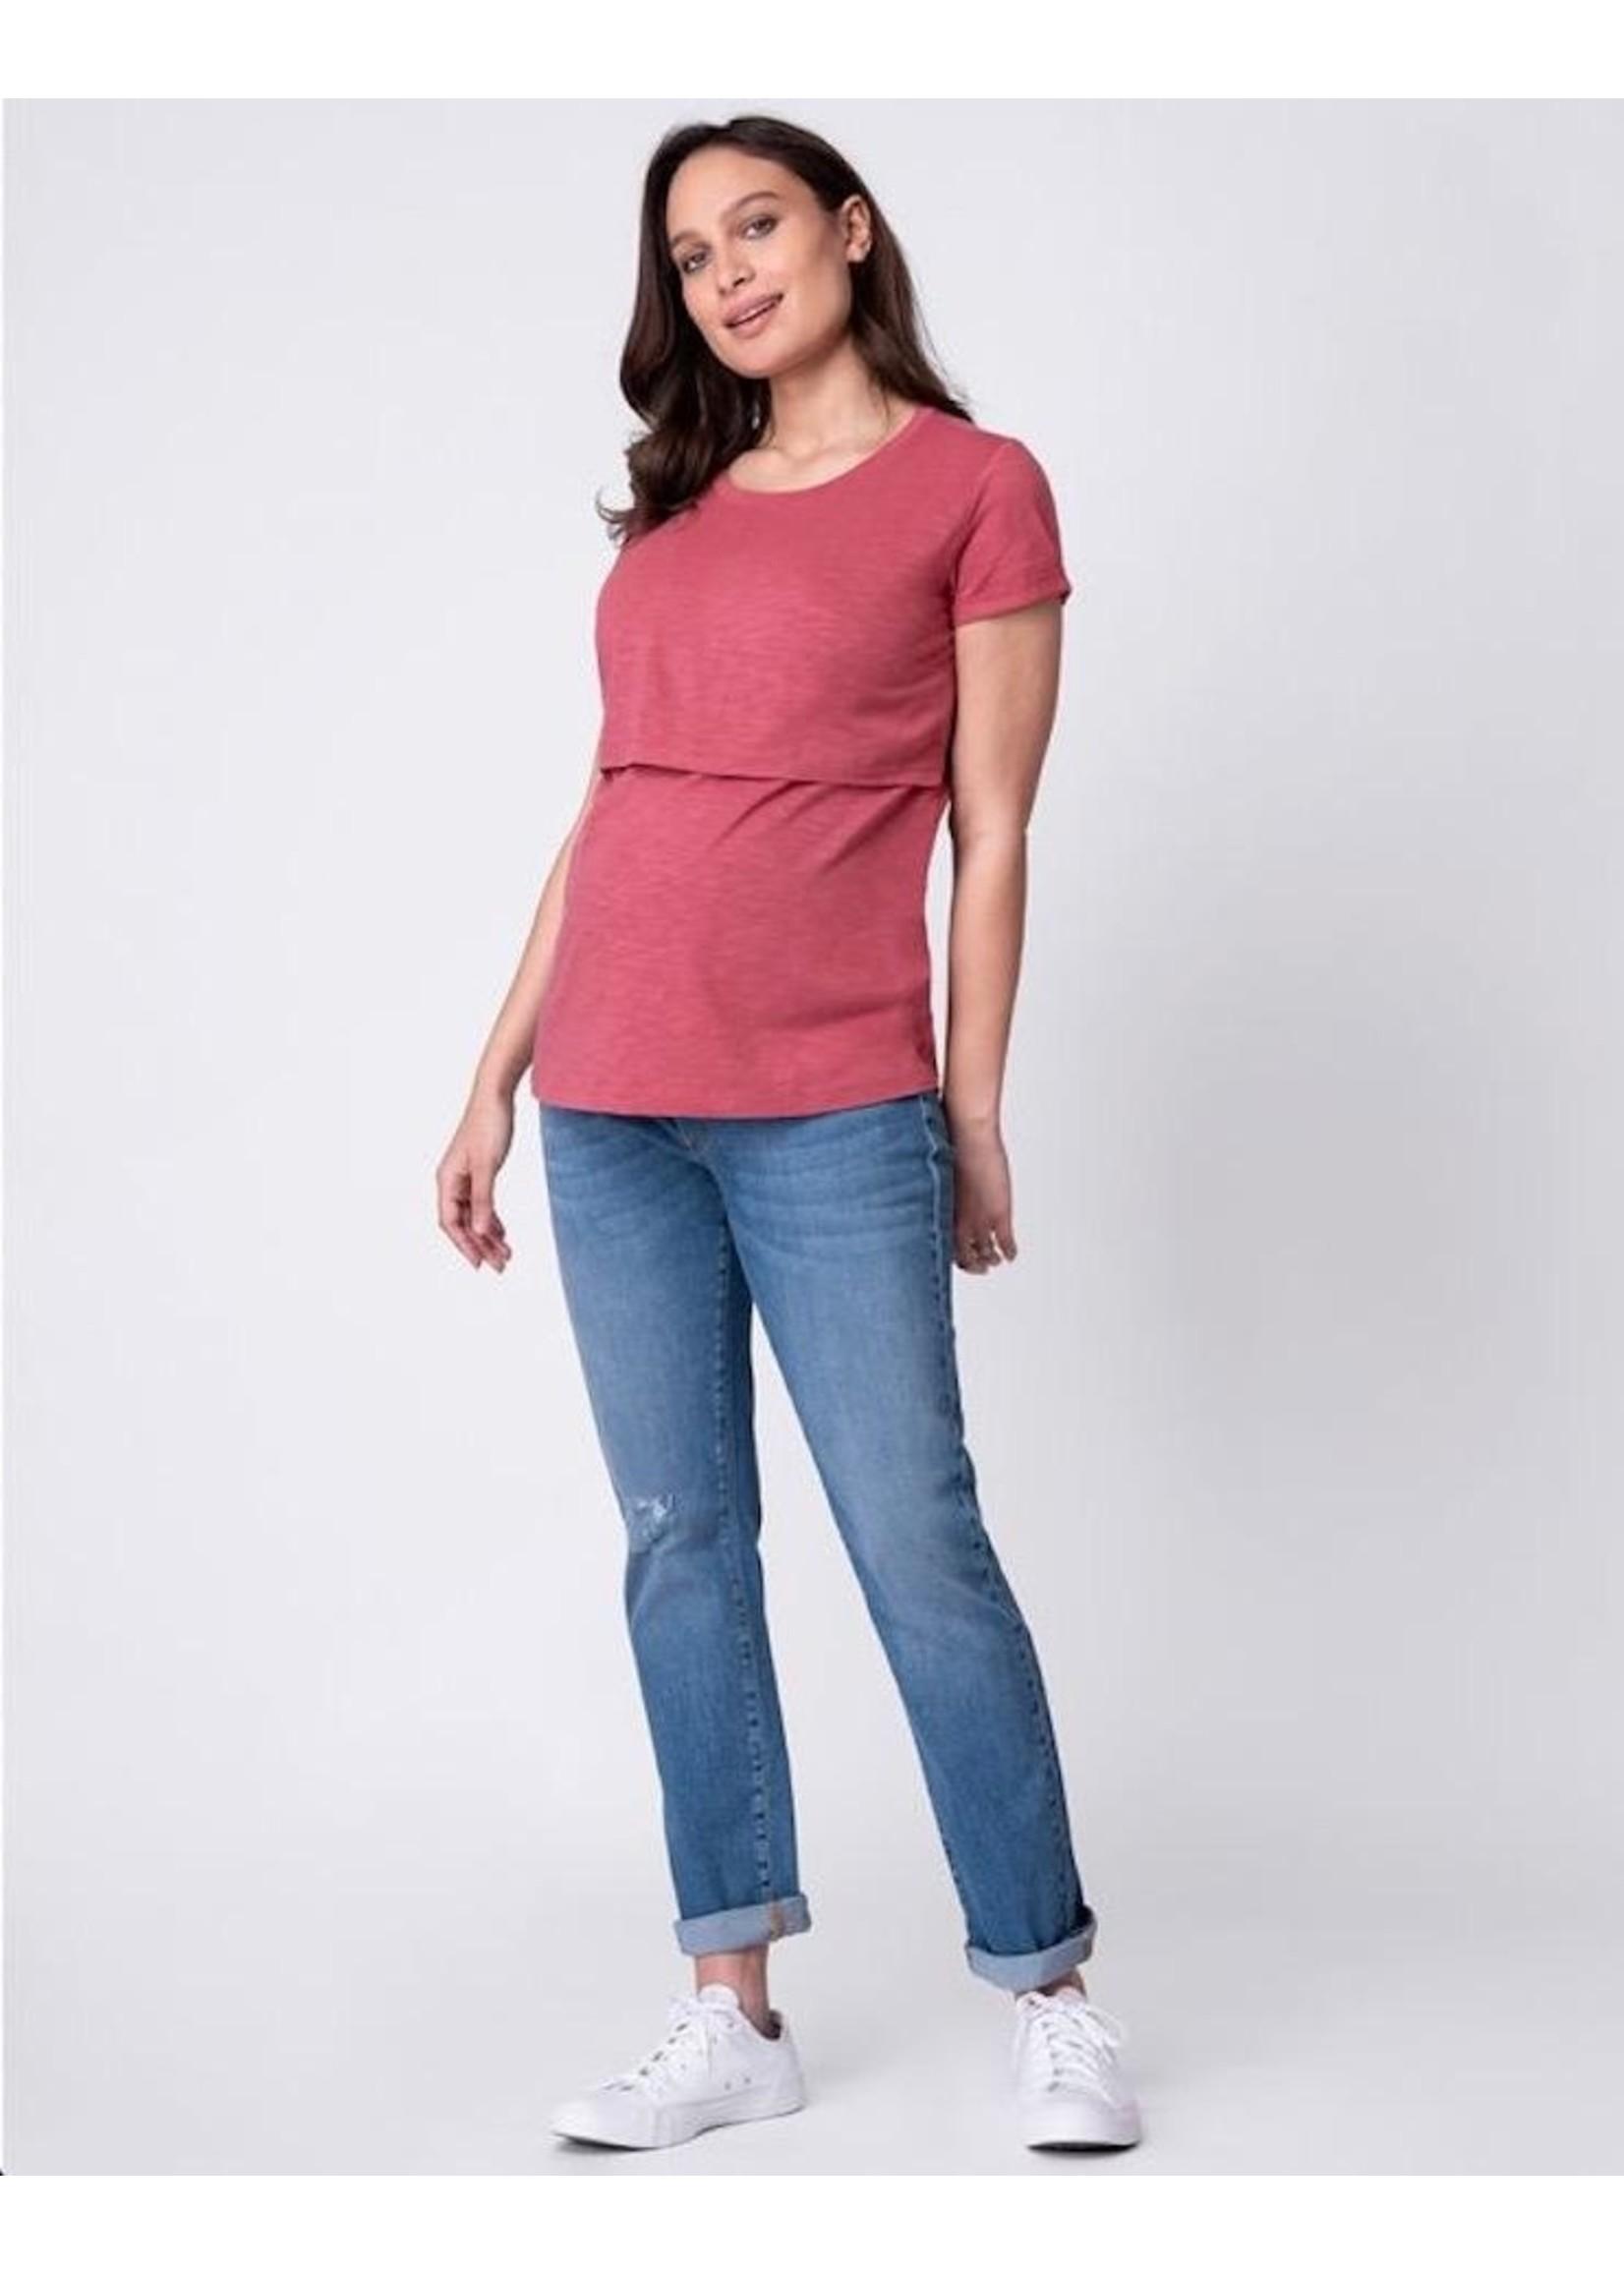 Seraphine Seraphine, Lulu Cotton Maternity & Nursing T-Shirt - Rose